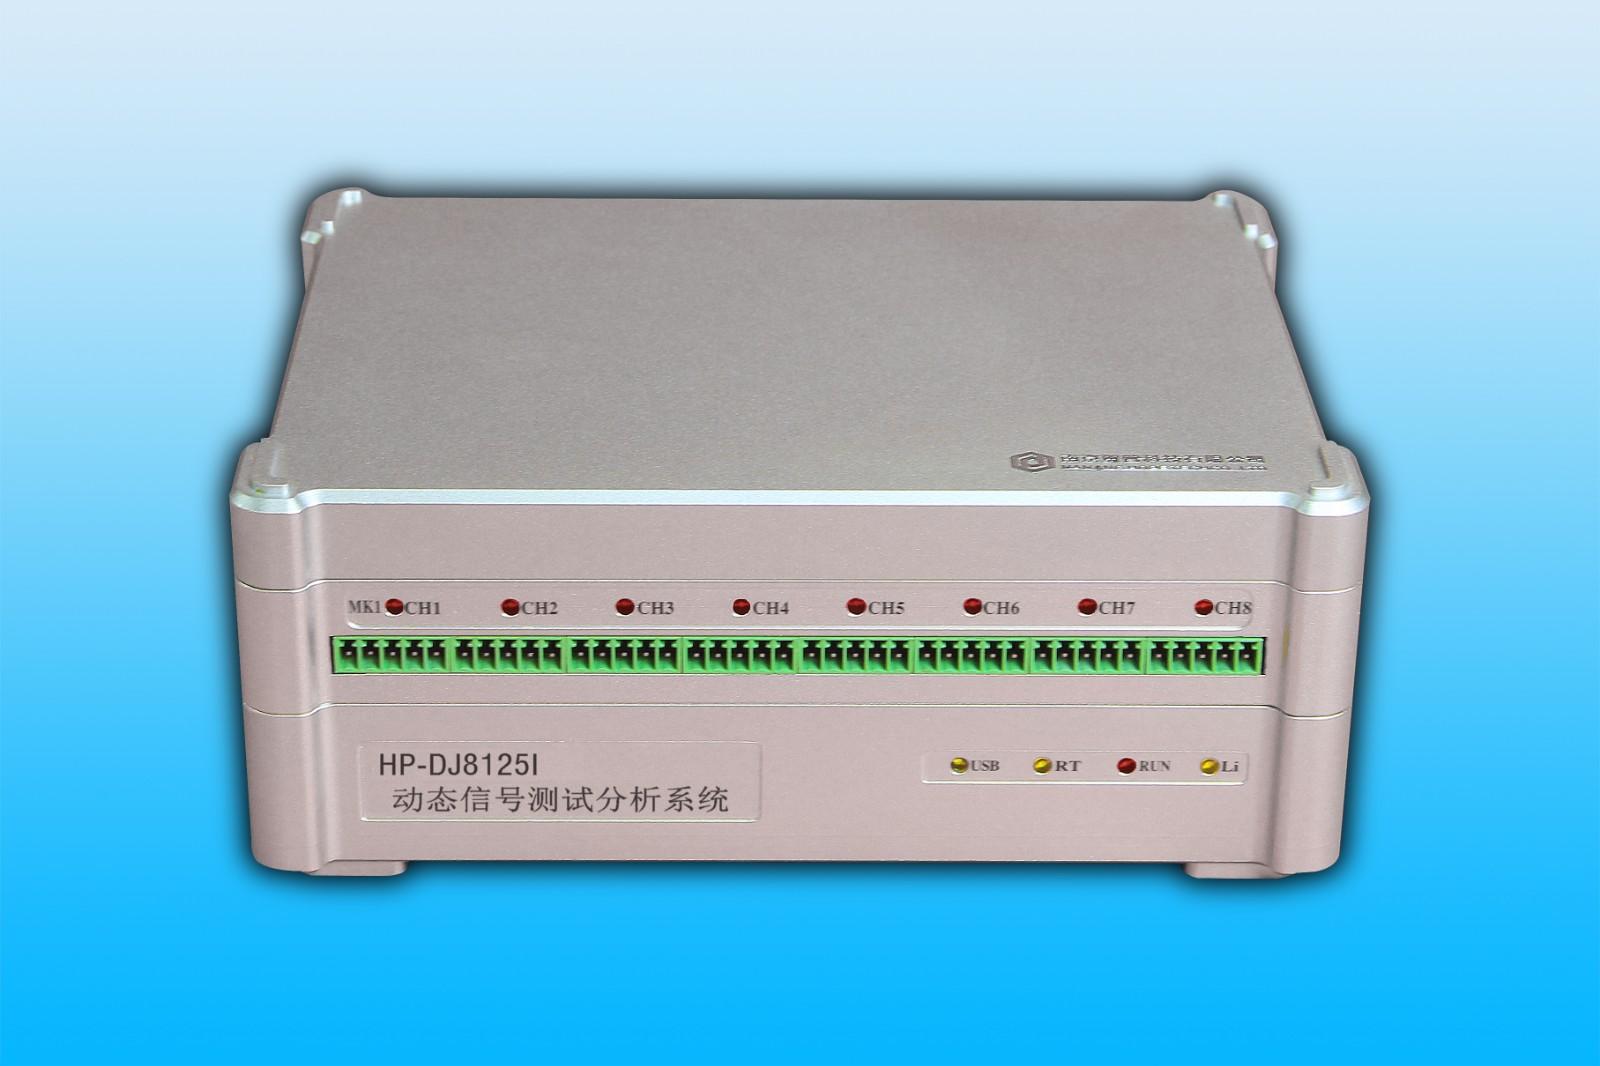 HP-DJ8125I 动态信号测试分析系统